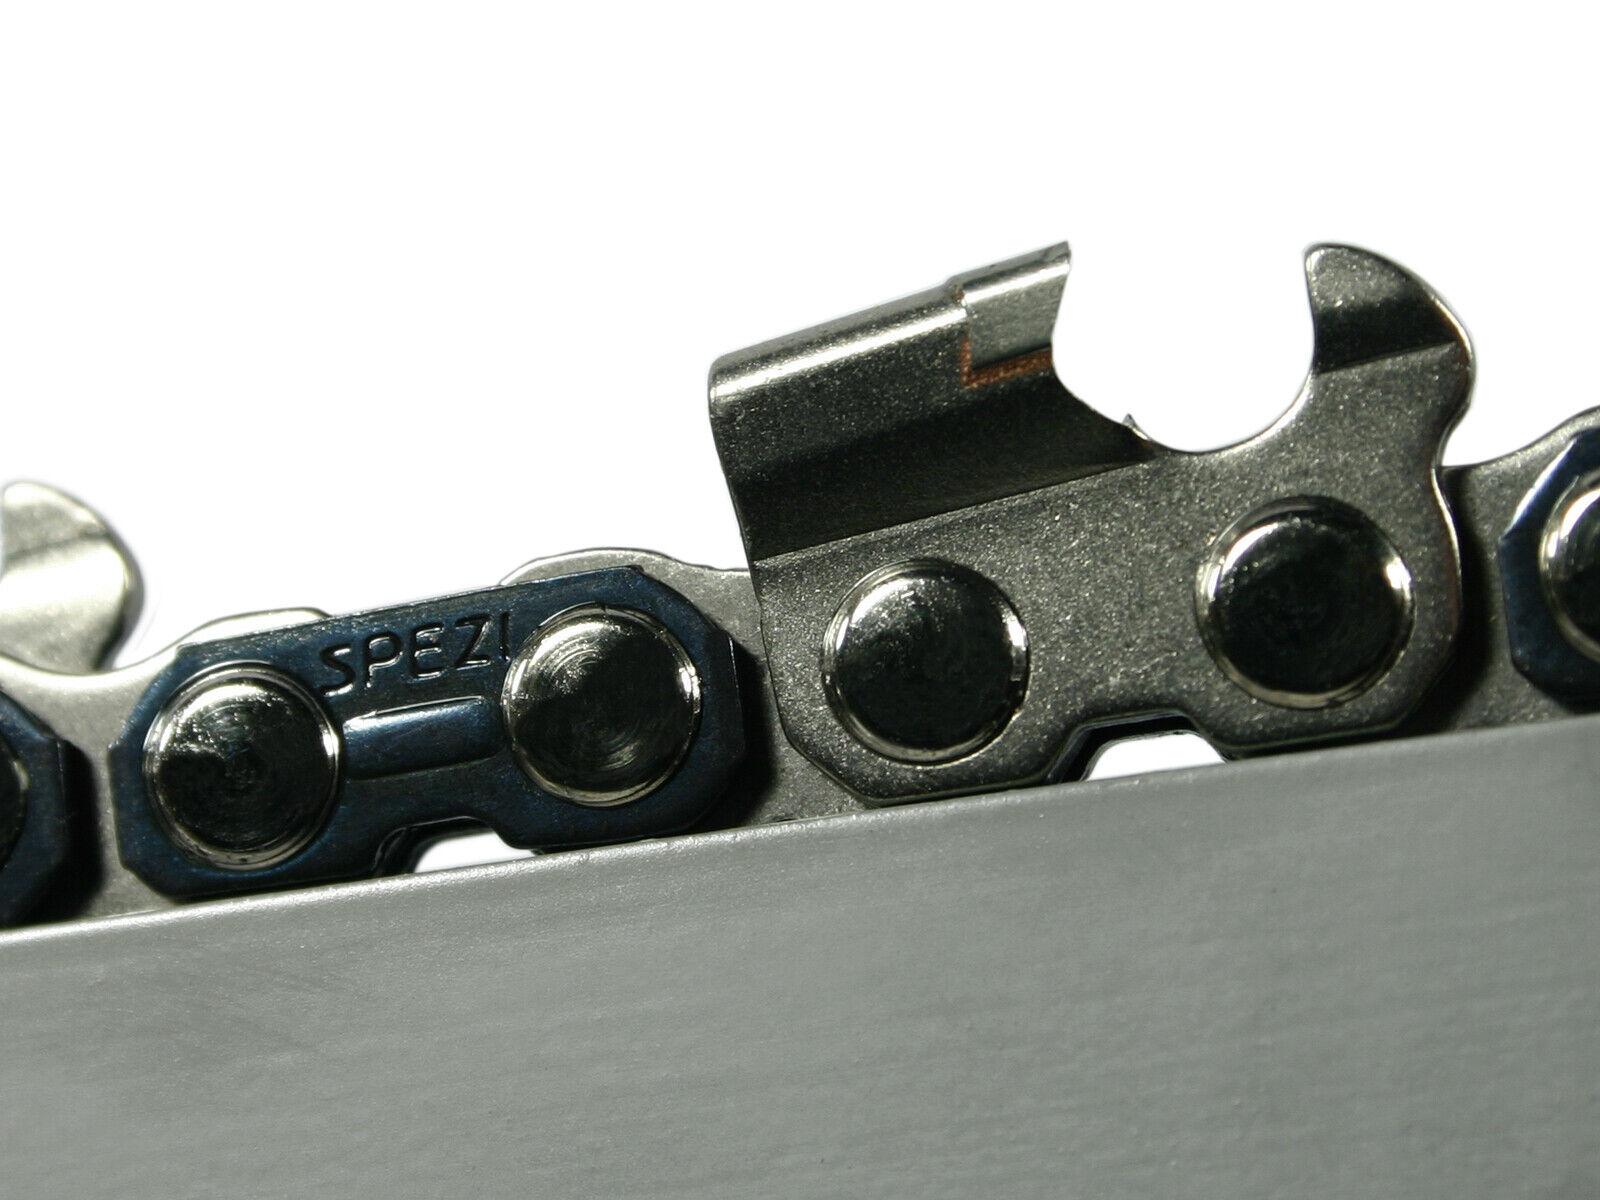 Metal duro para sierra cadena compatible con still 075 076 Av 53 cm 404  68 TG 1,6 mm Chain